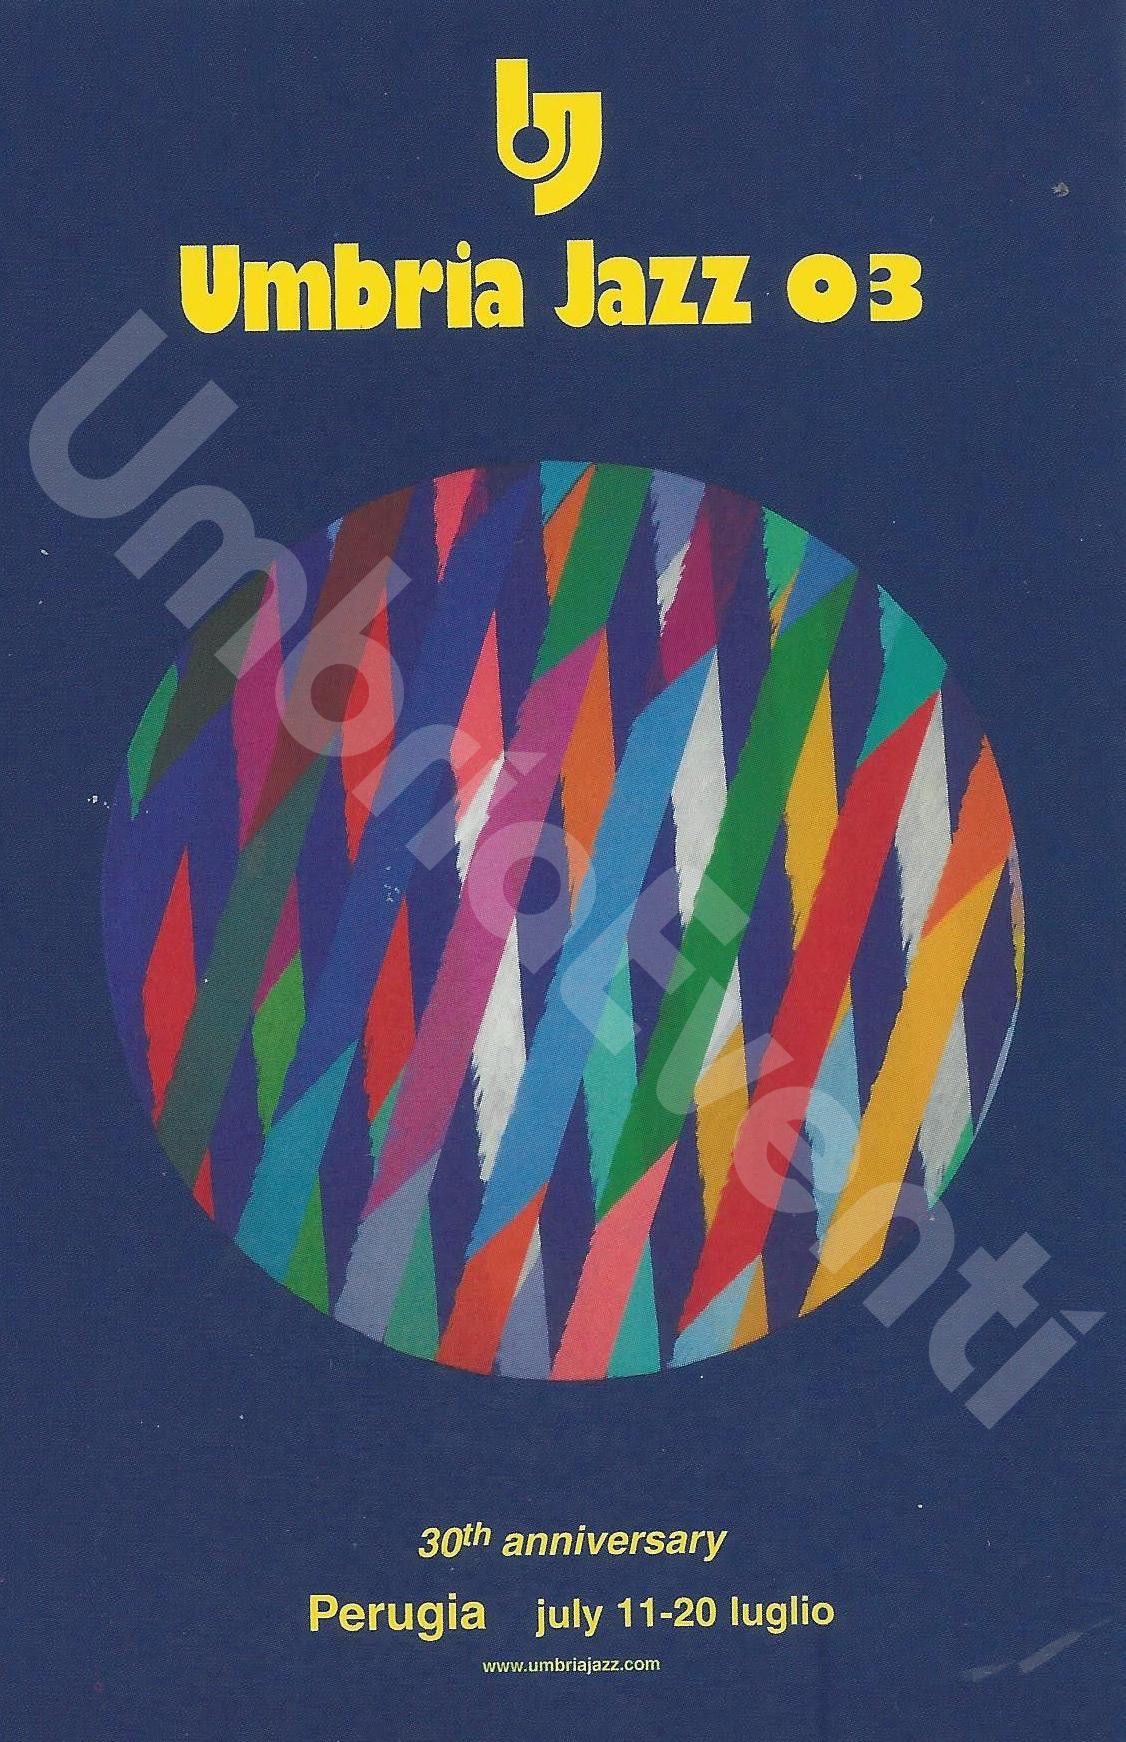 2003 Umbria Jazz